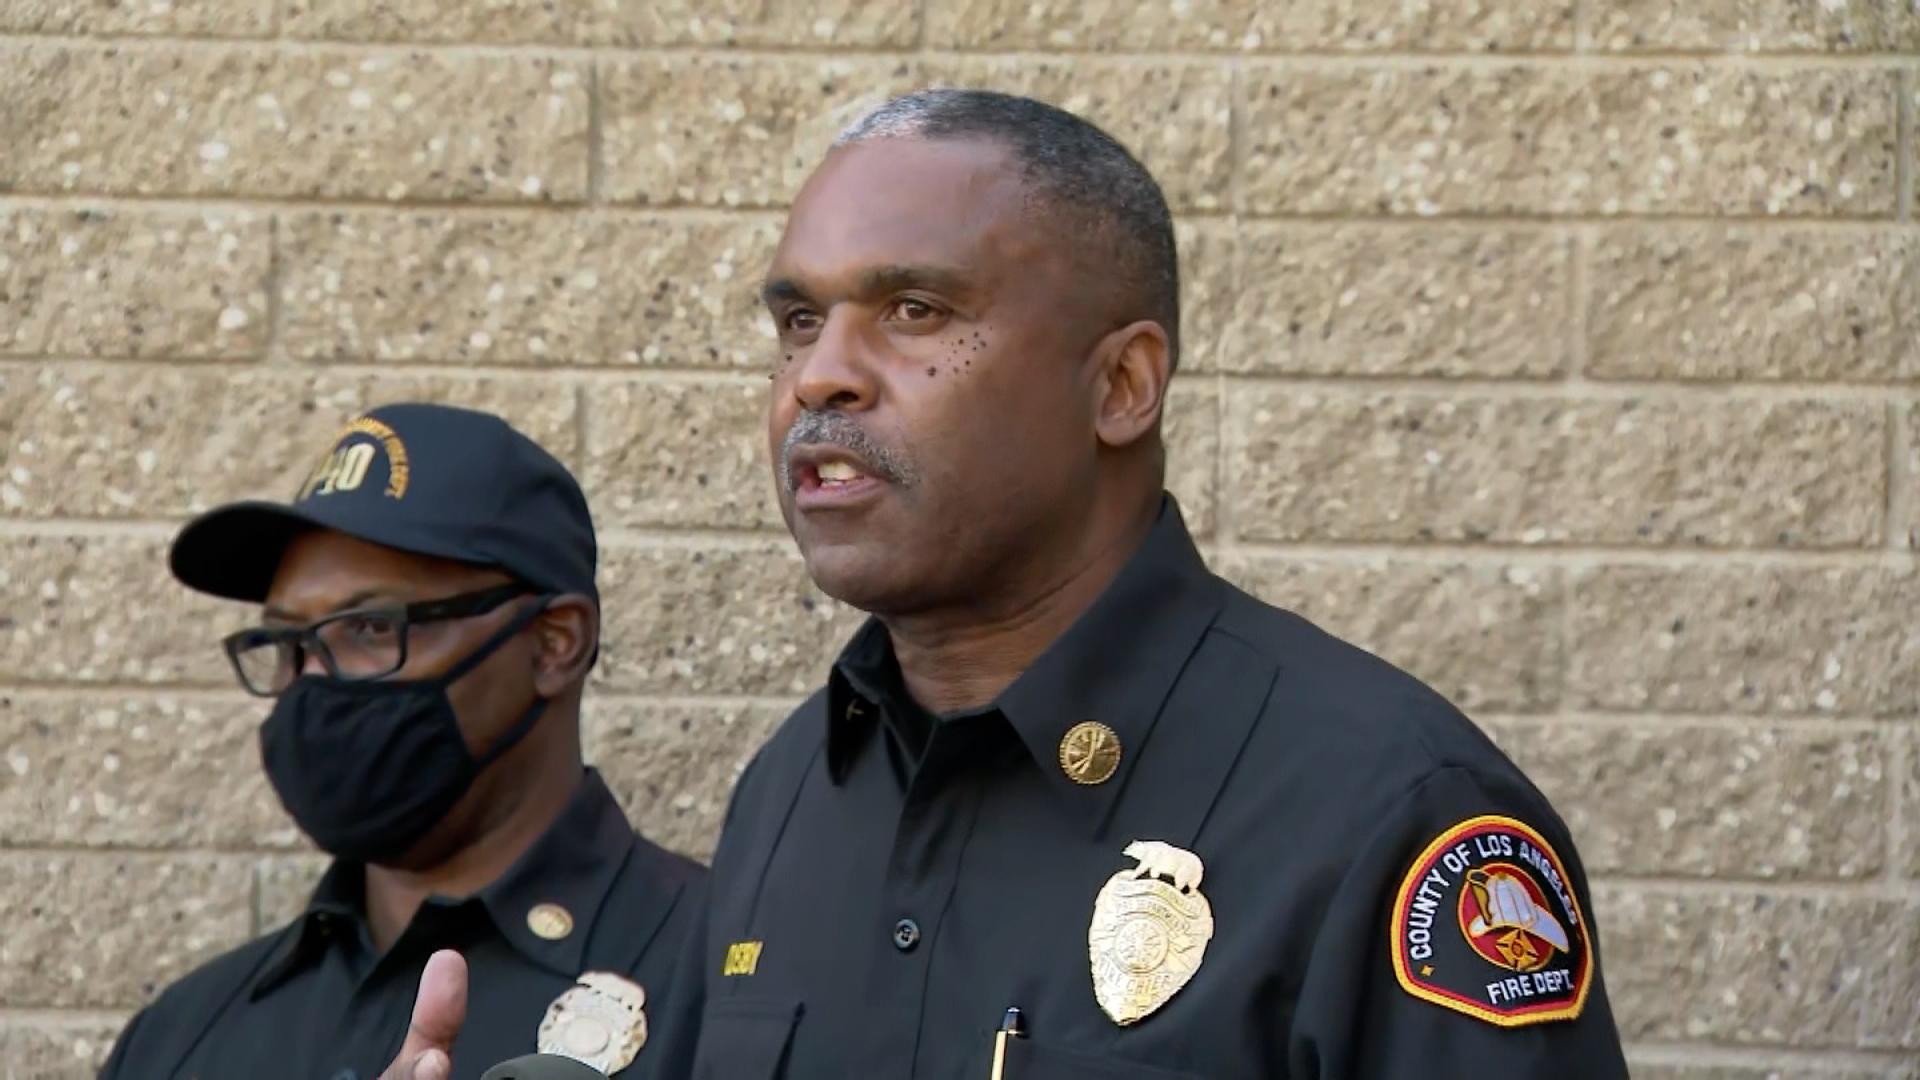 County Fire Chief Daryl Osby.